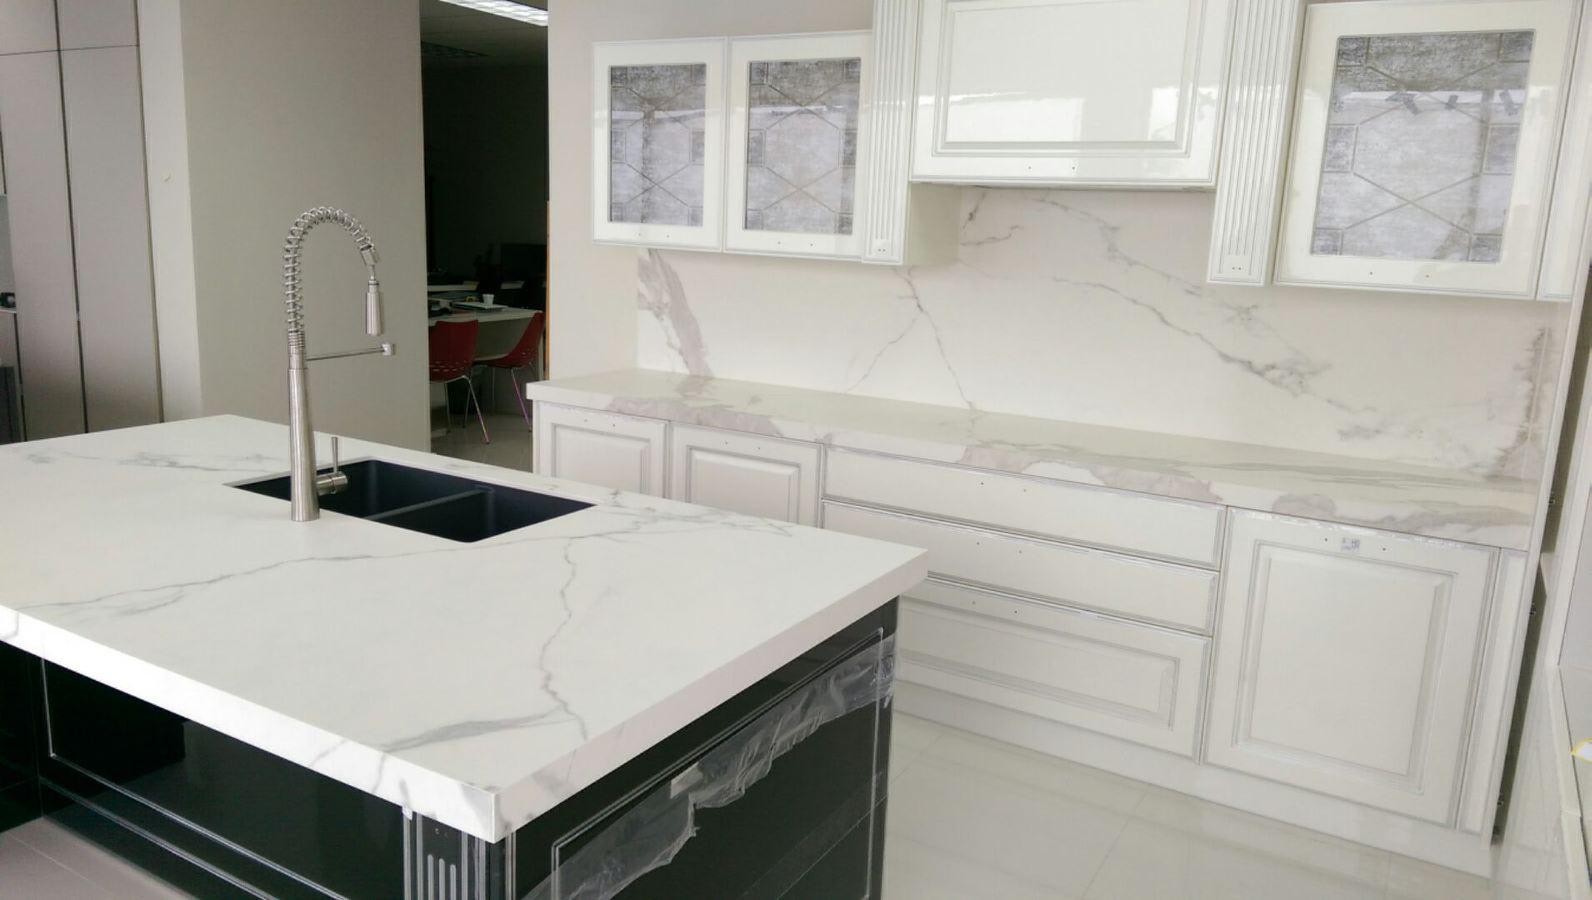 kitchen cabinets columbus appliance ratings estatuario - omicron granite & tile